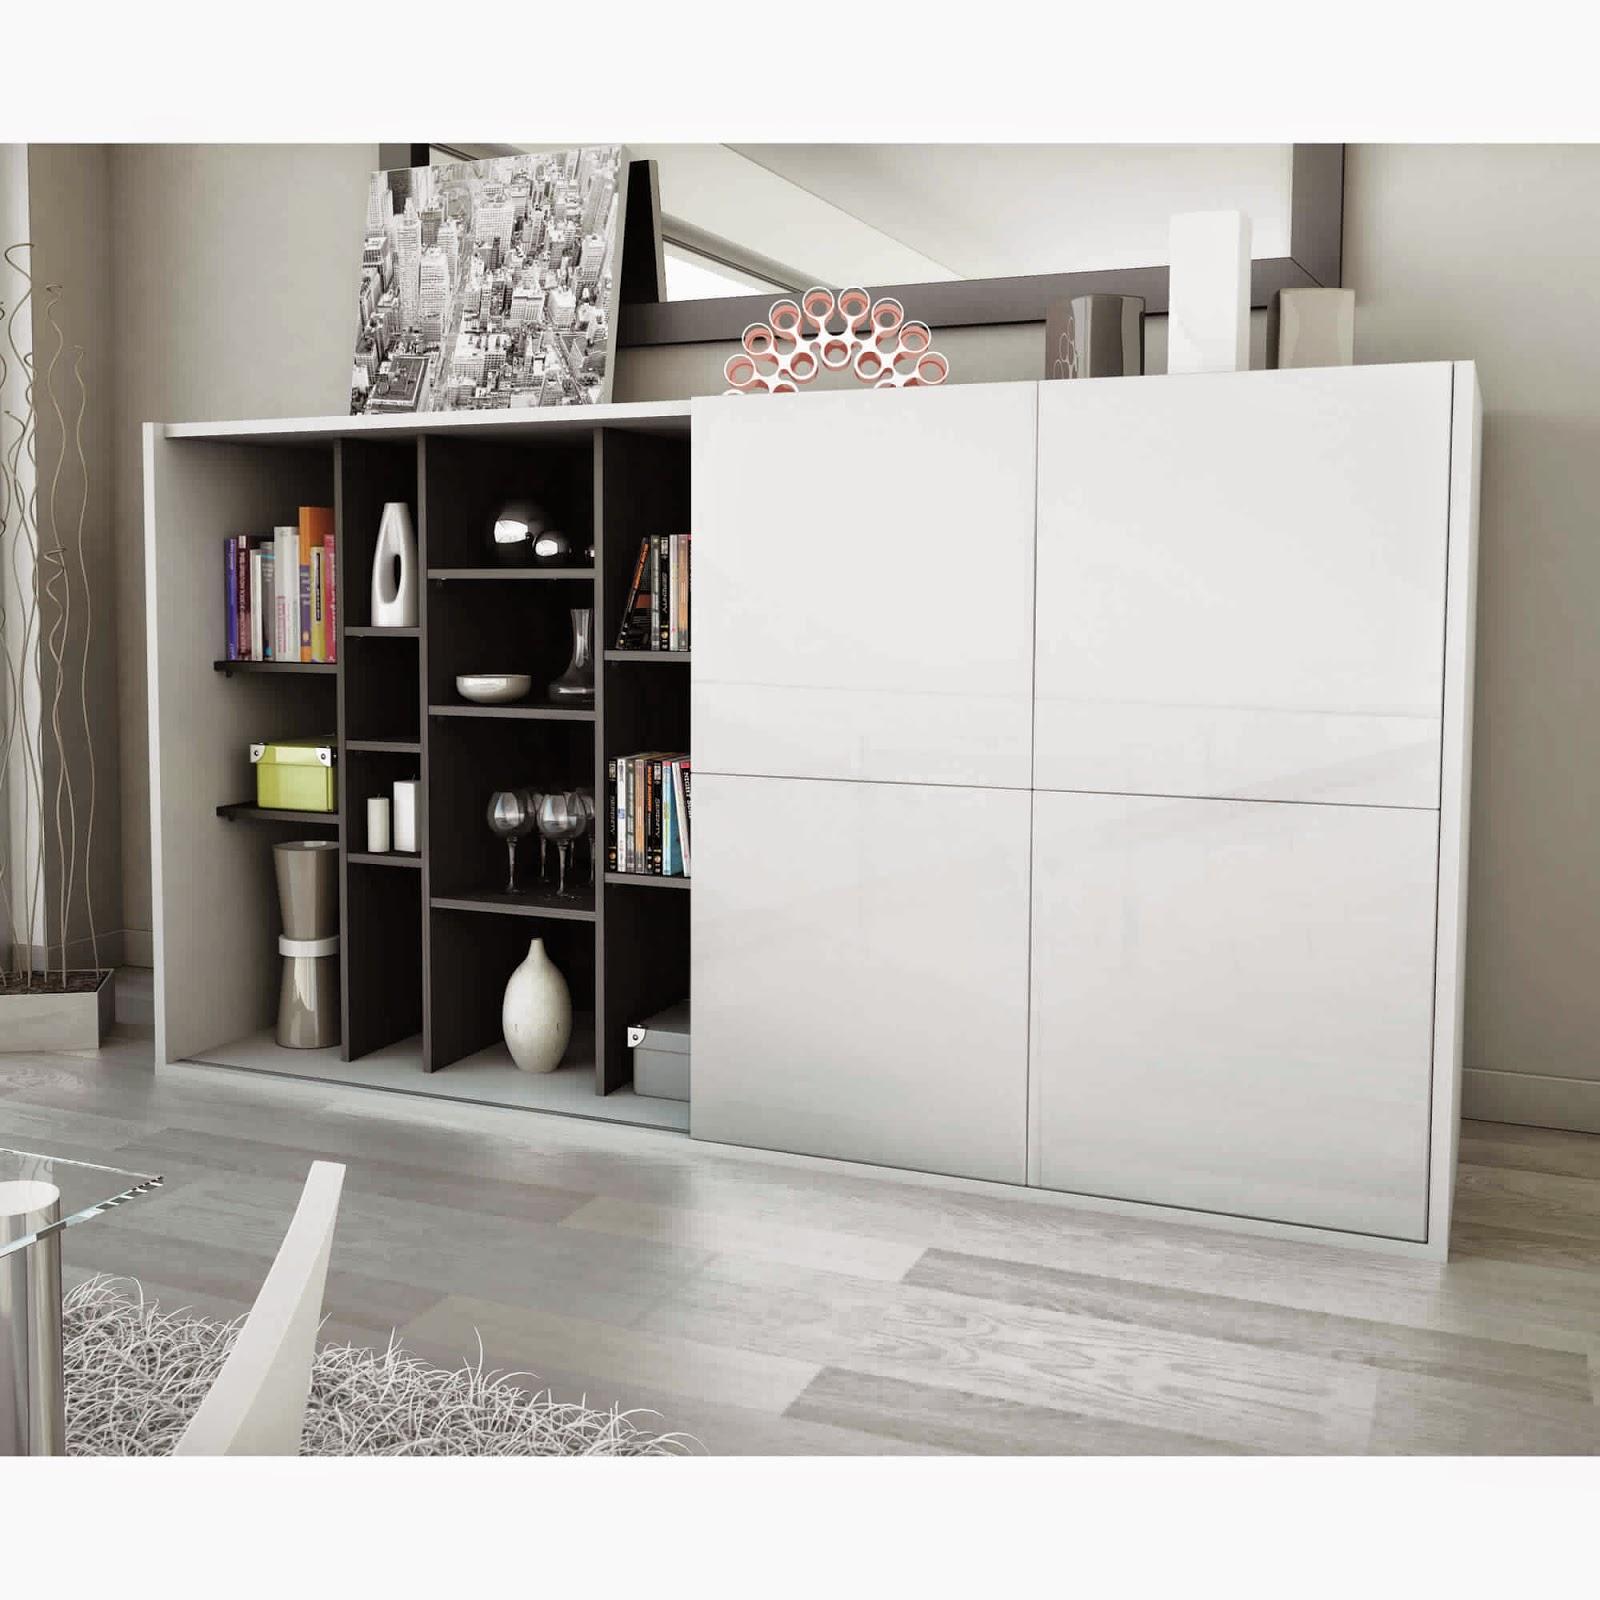 Meuble tv avec porte coulissante meuble tv for Meuble mural avec porte coulissante